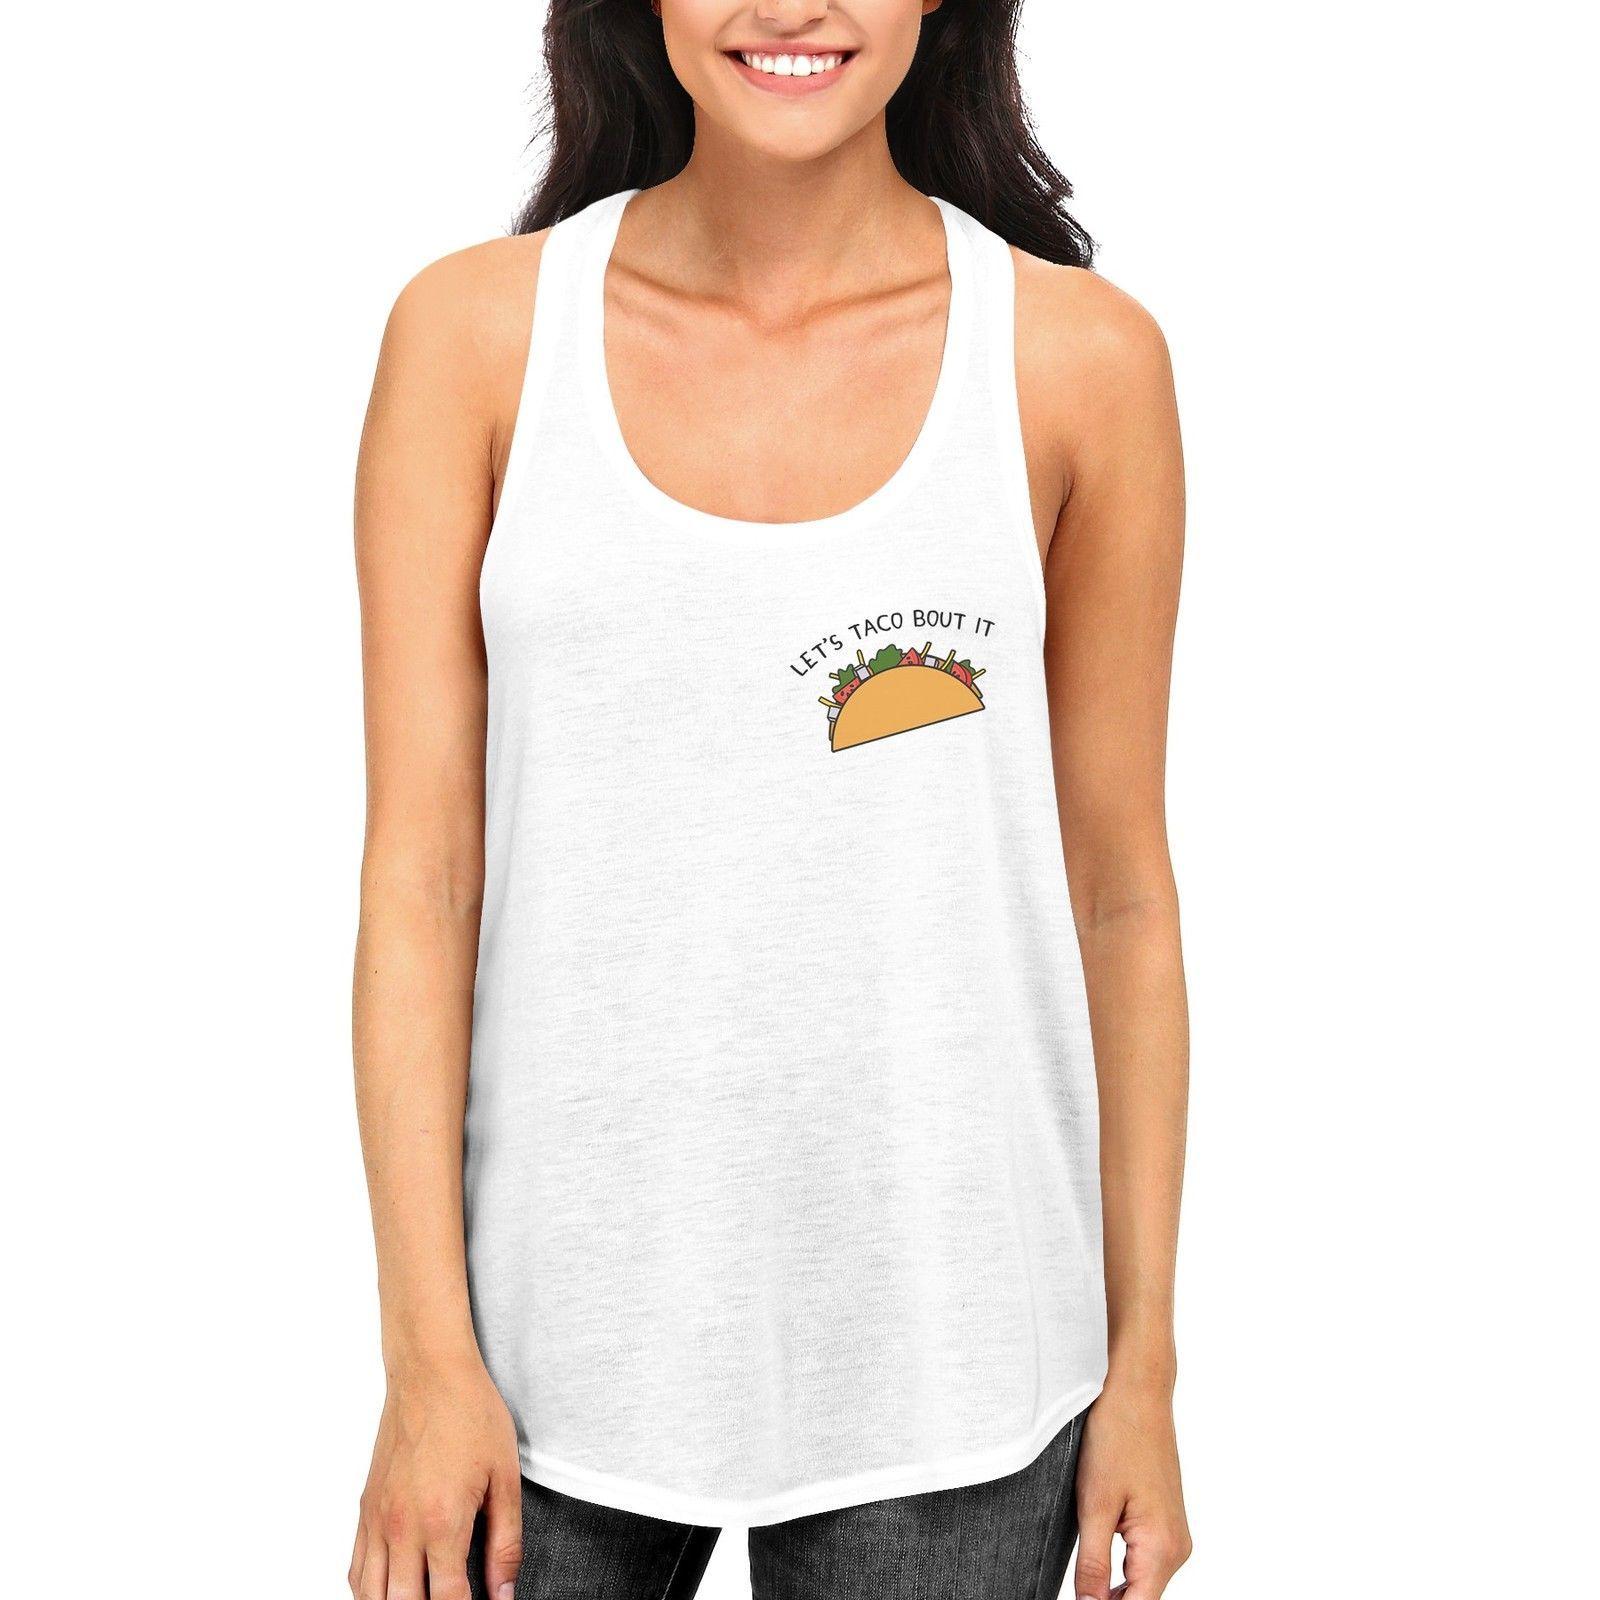 Let's Taco About It Funny Women's Tanktop Cute Pocket Print Racerback Tanks - $14.99